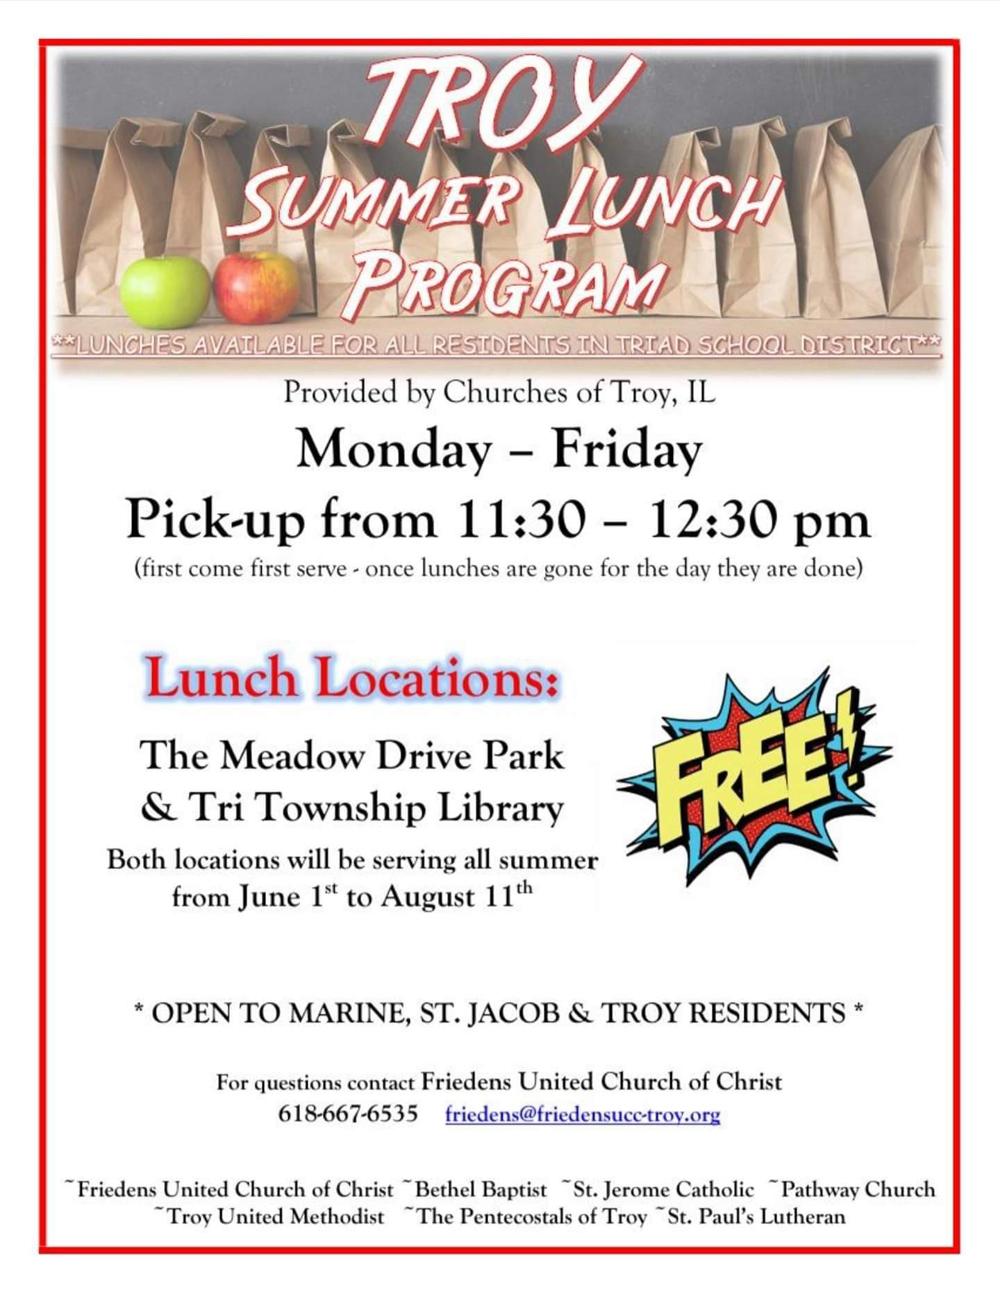 Troy Summer Lunch Program